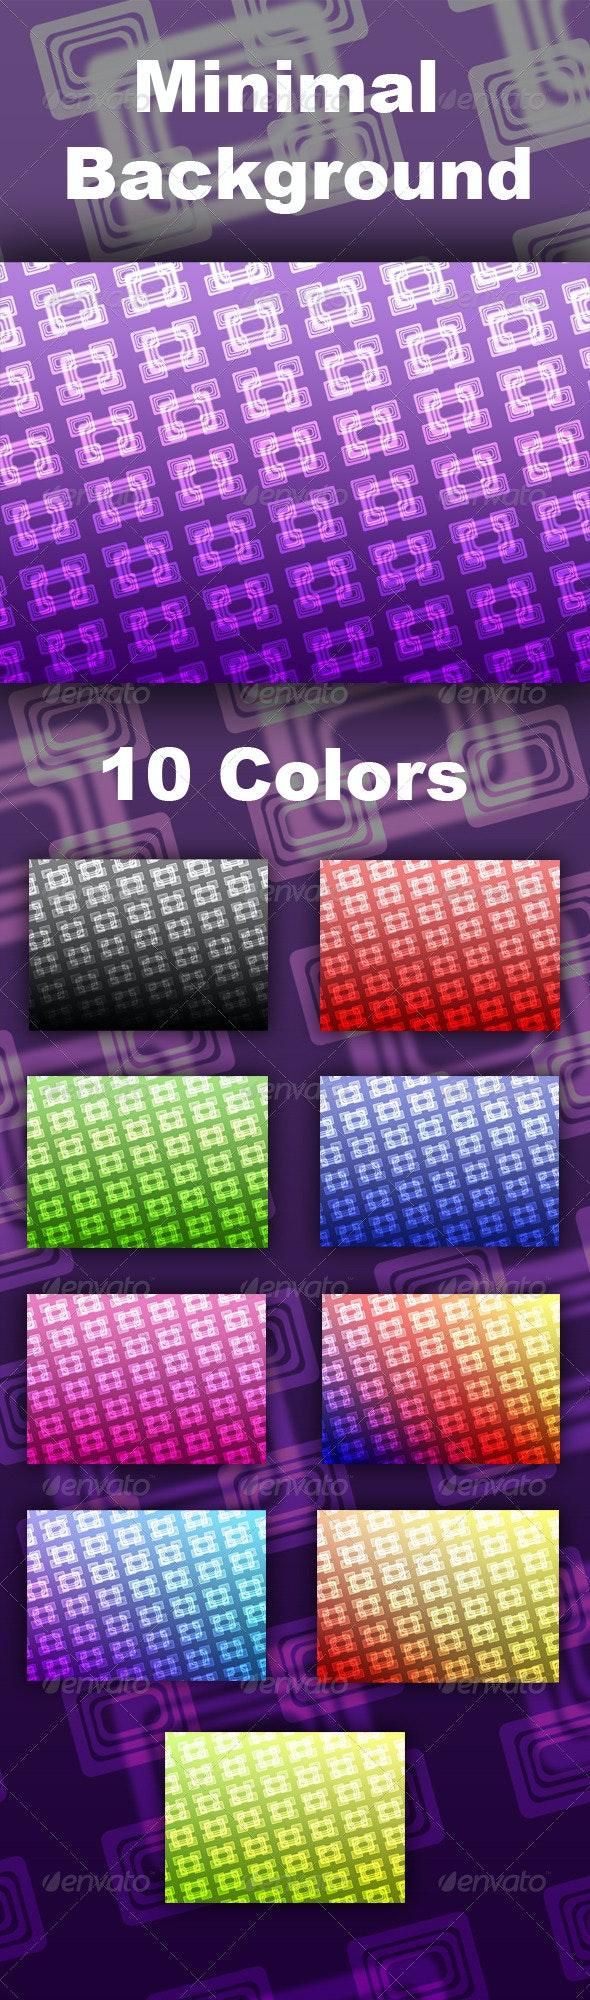 Minimal Background - Backgrounds Graphics